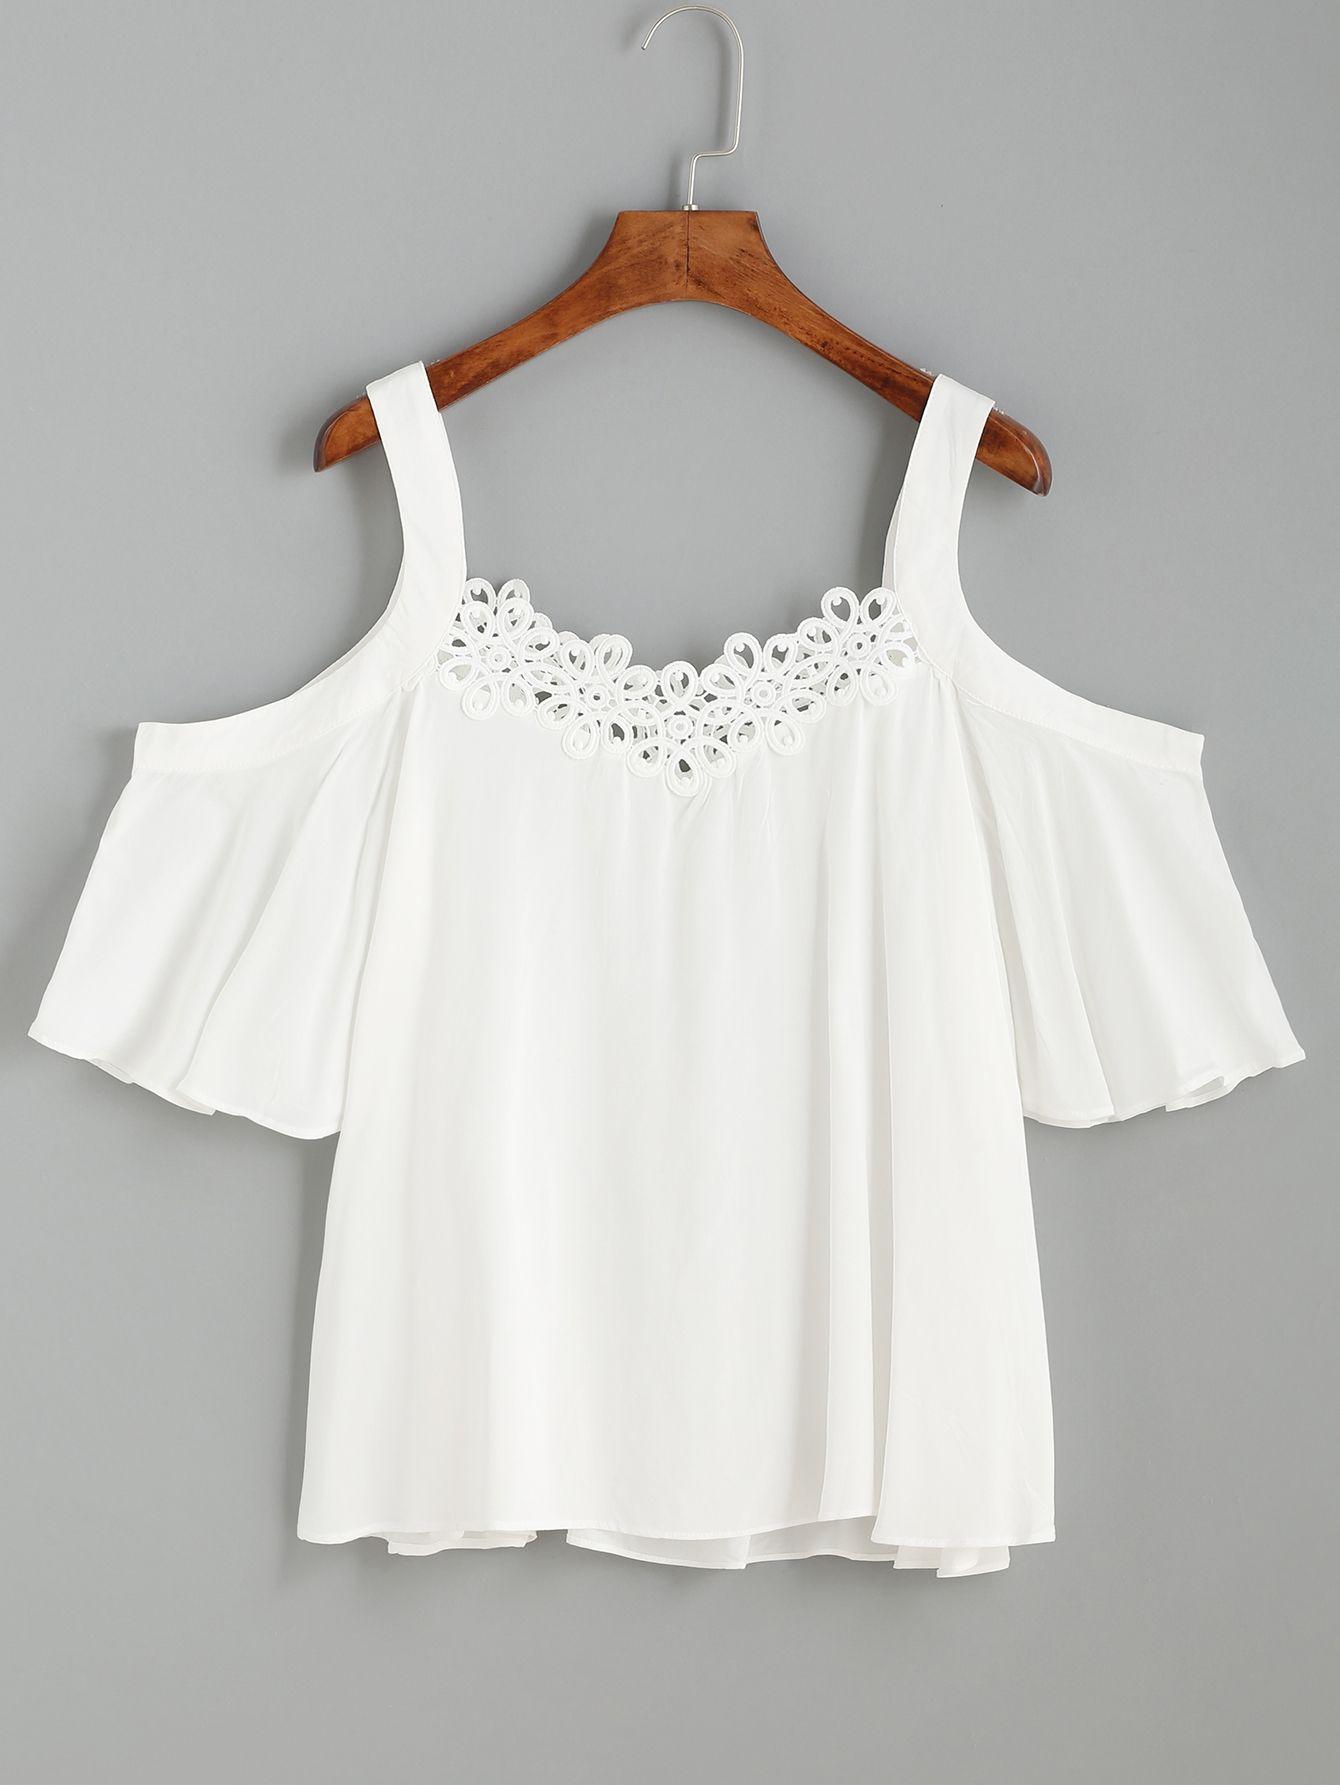 White Cold Shoulder Crochet Trim Top | Women\'s Basic | Pinterest ...